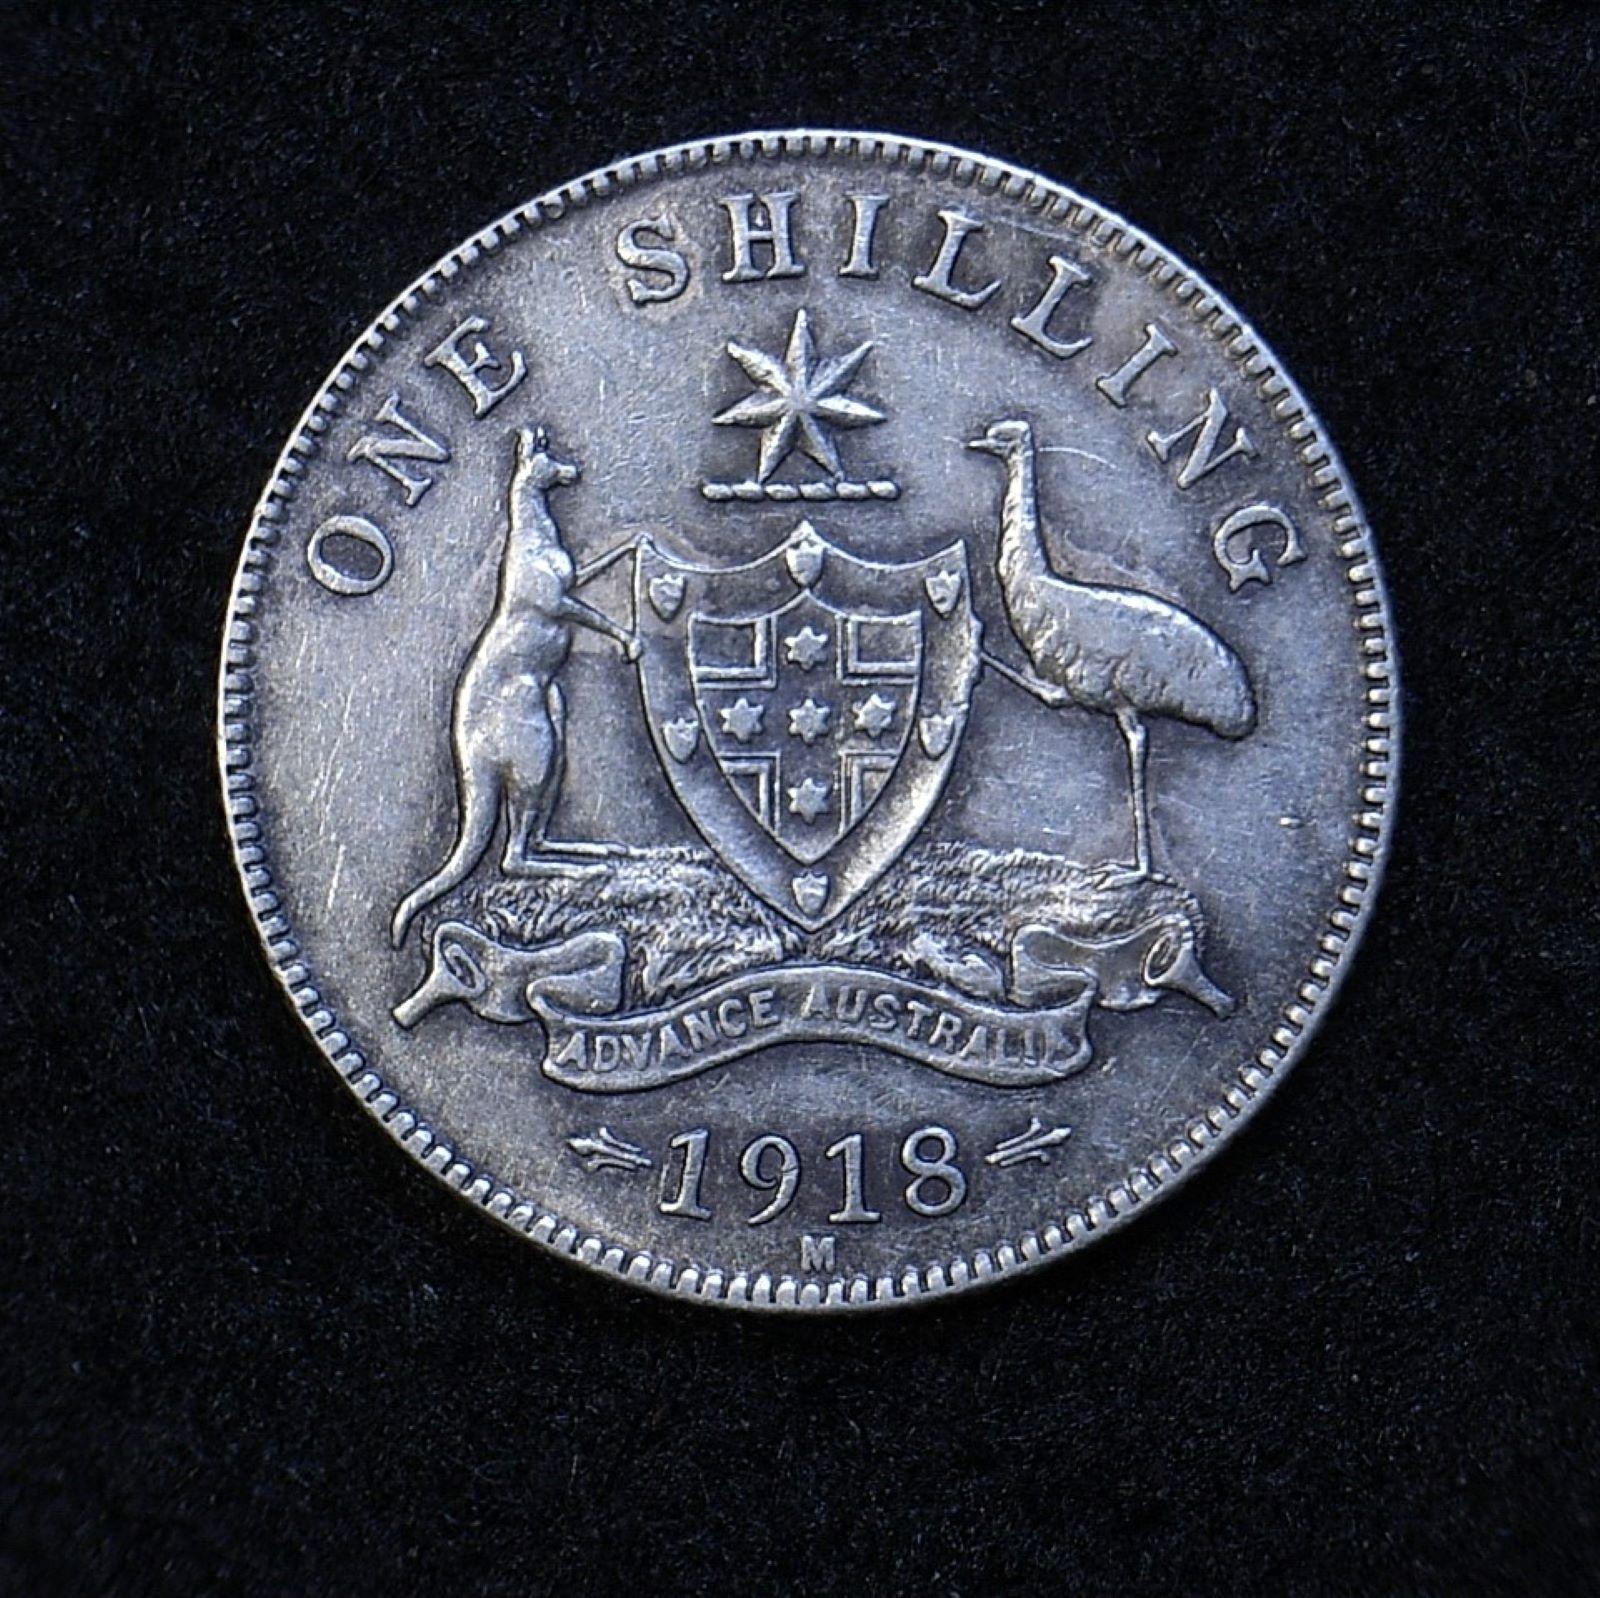 Aus Shilling 1918M rev 1